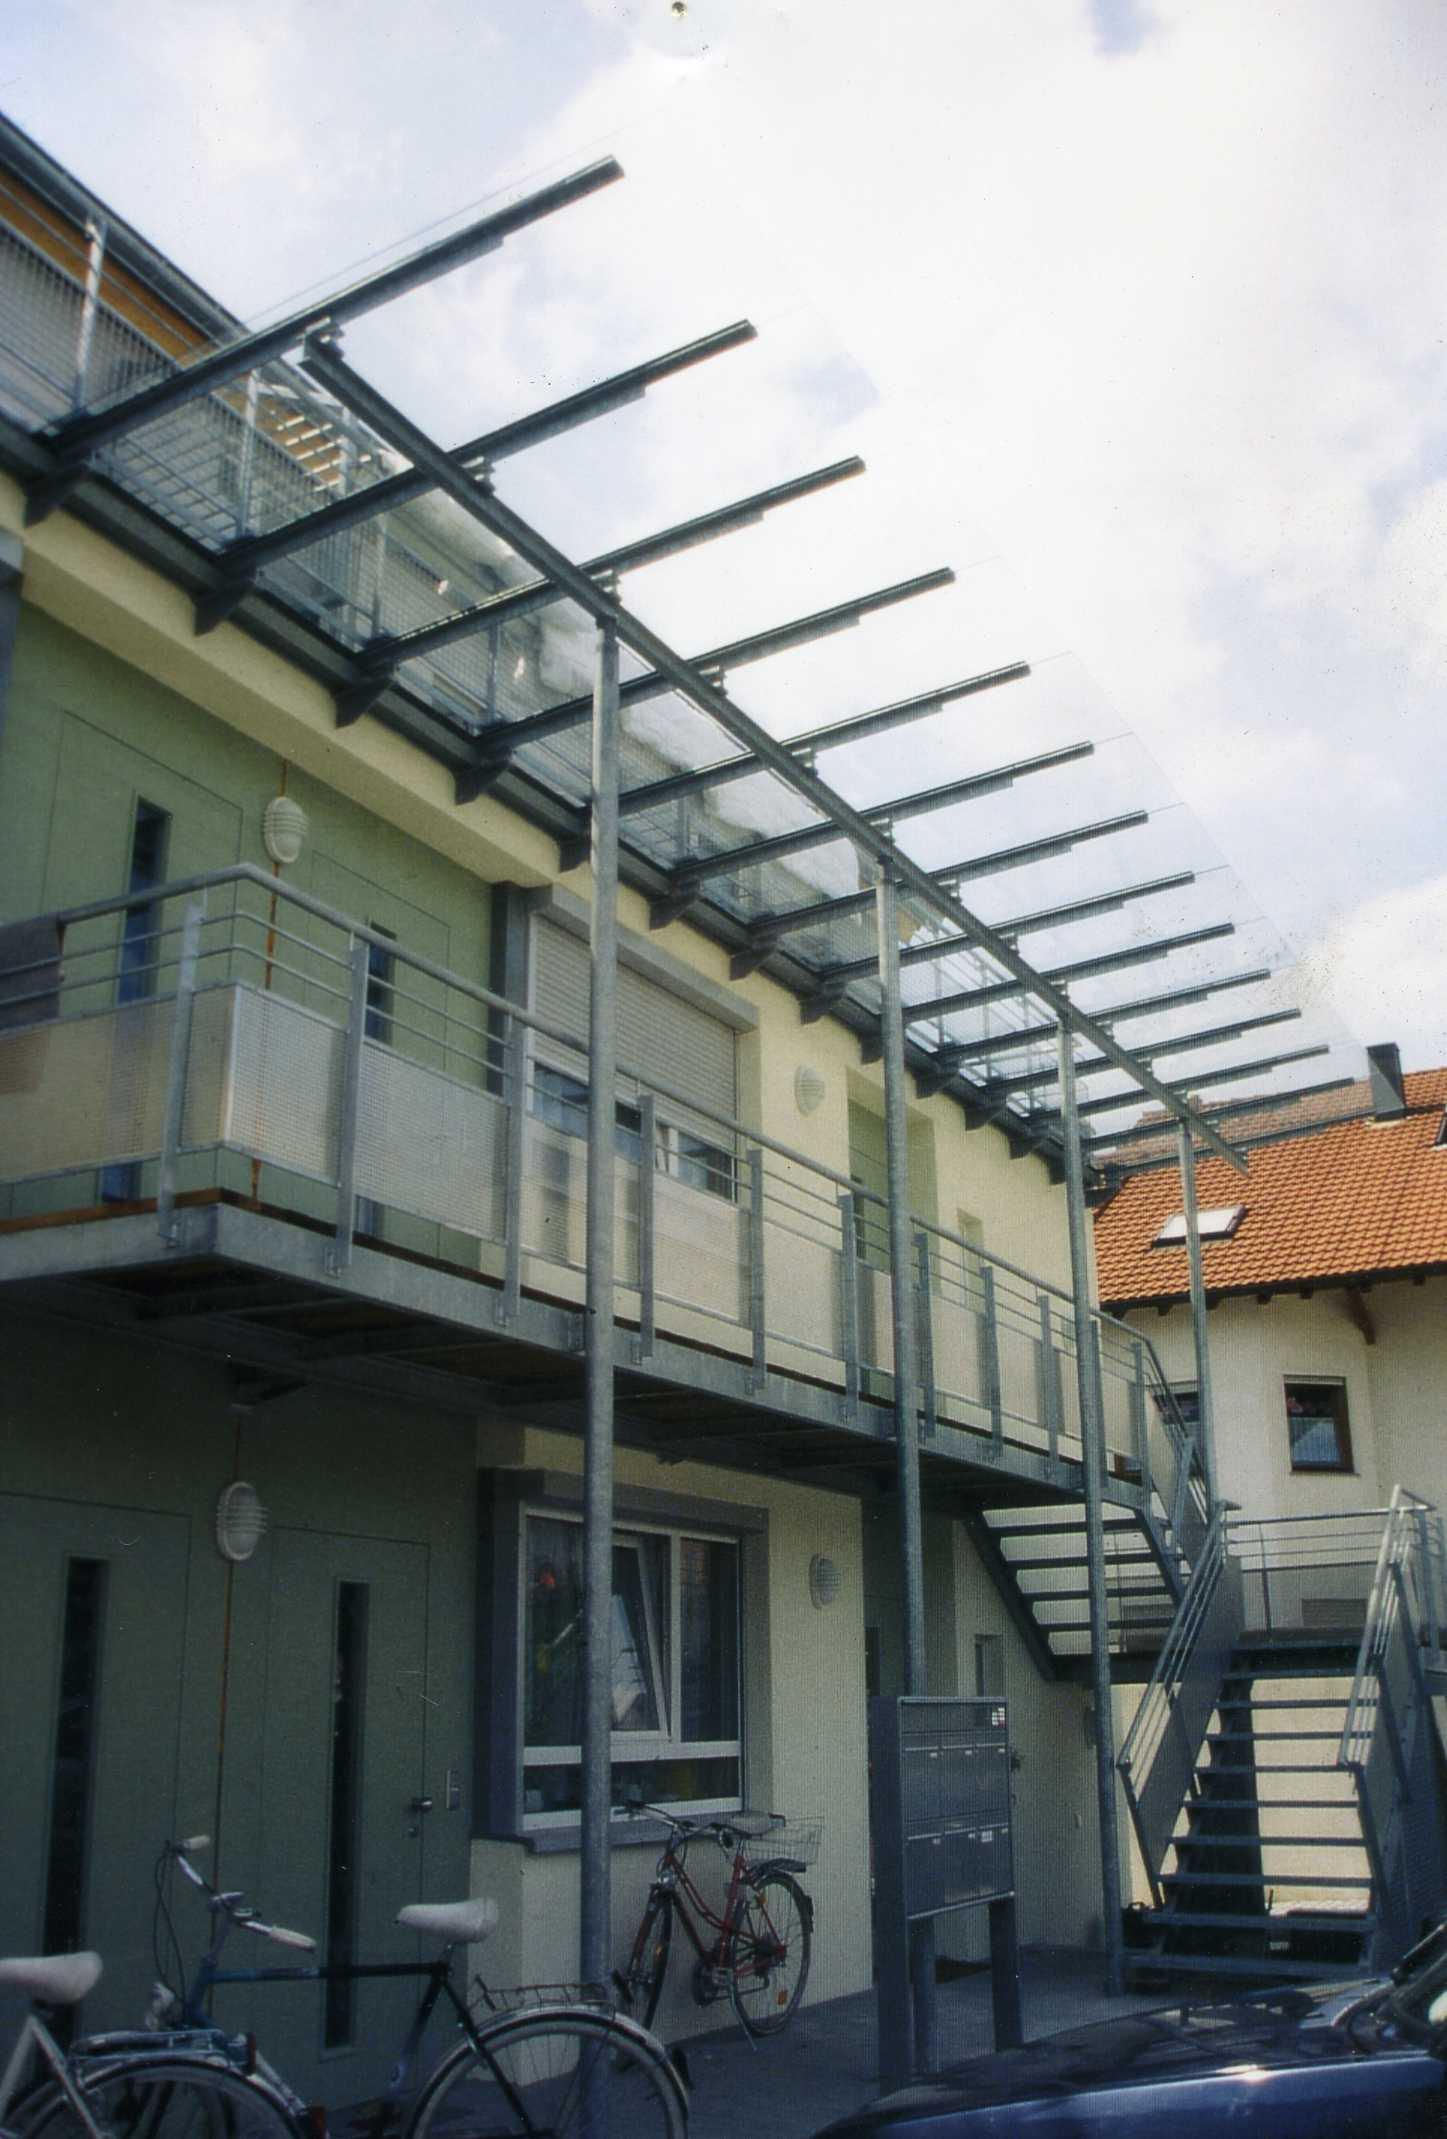 Laubengang MFH, Urbach 2000